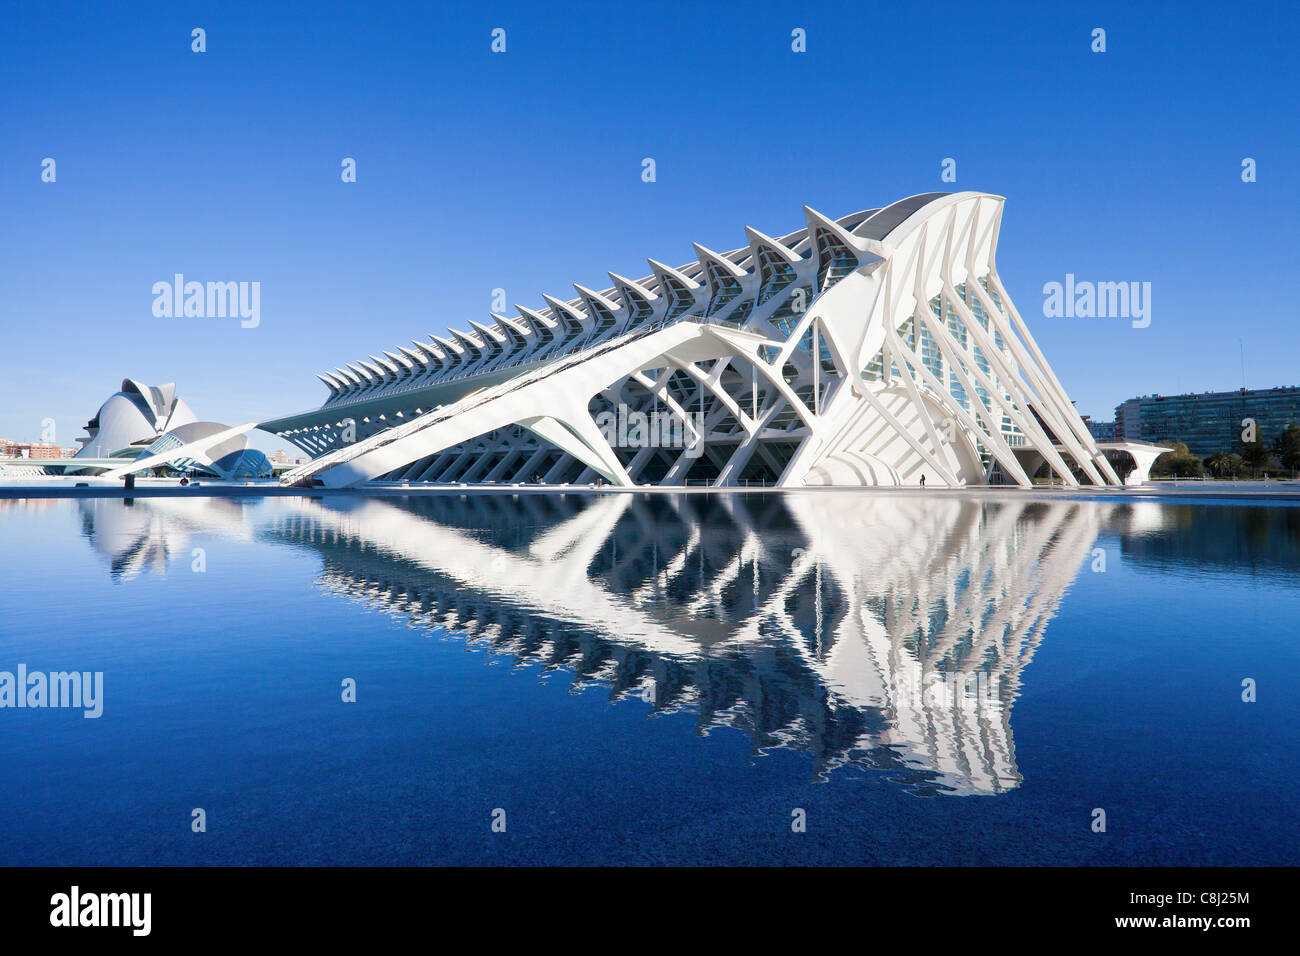 Spain, Europe, Valencia, City of Arts and Science, Calatrava, architecture, modern, water Stock Photo